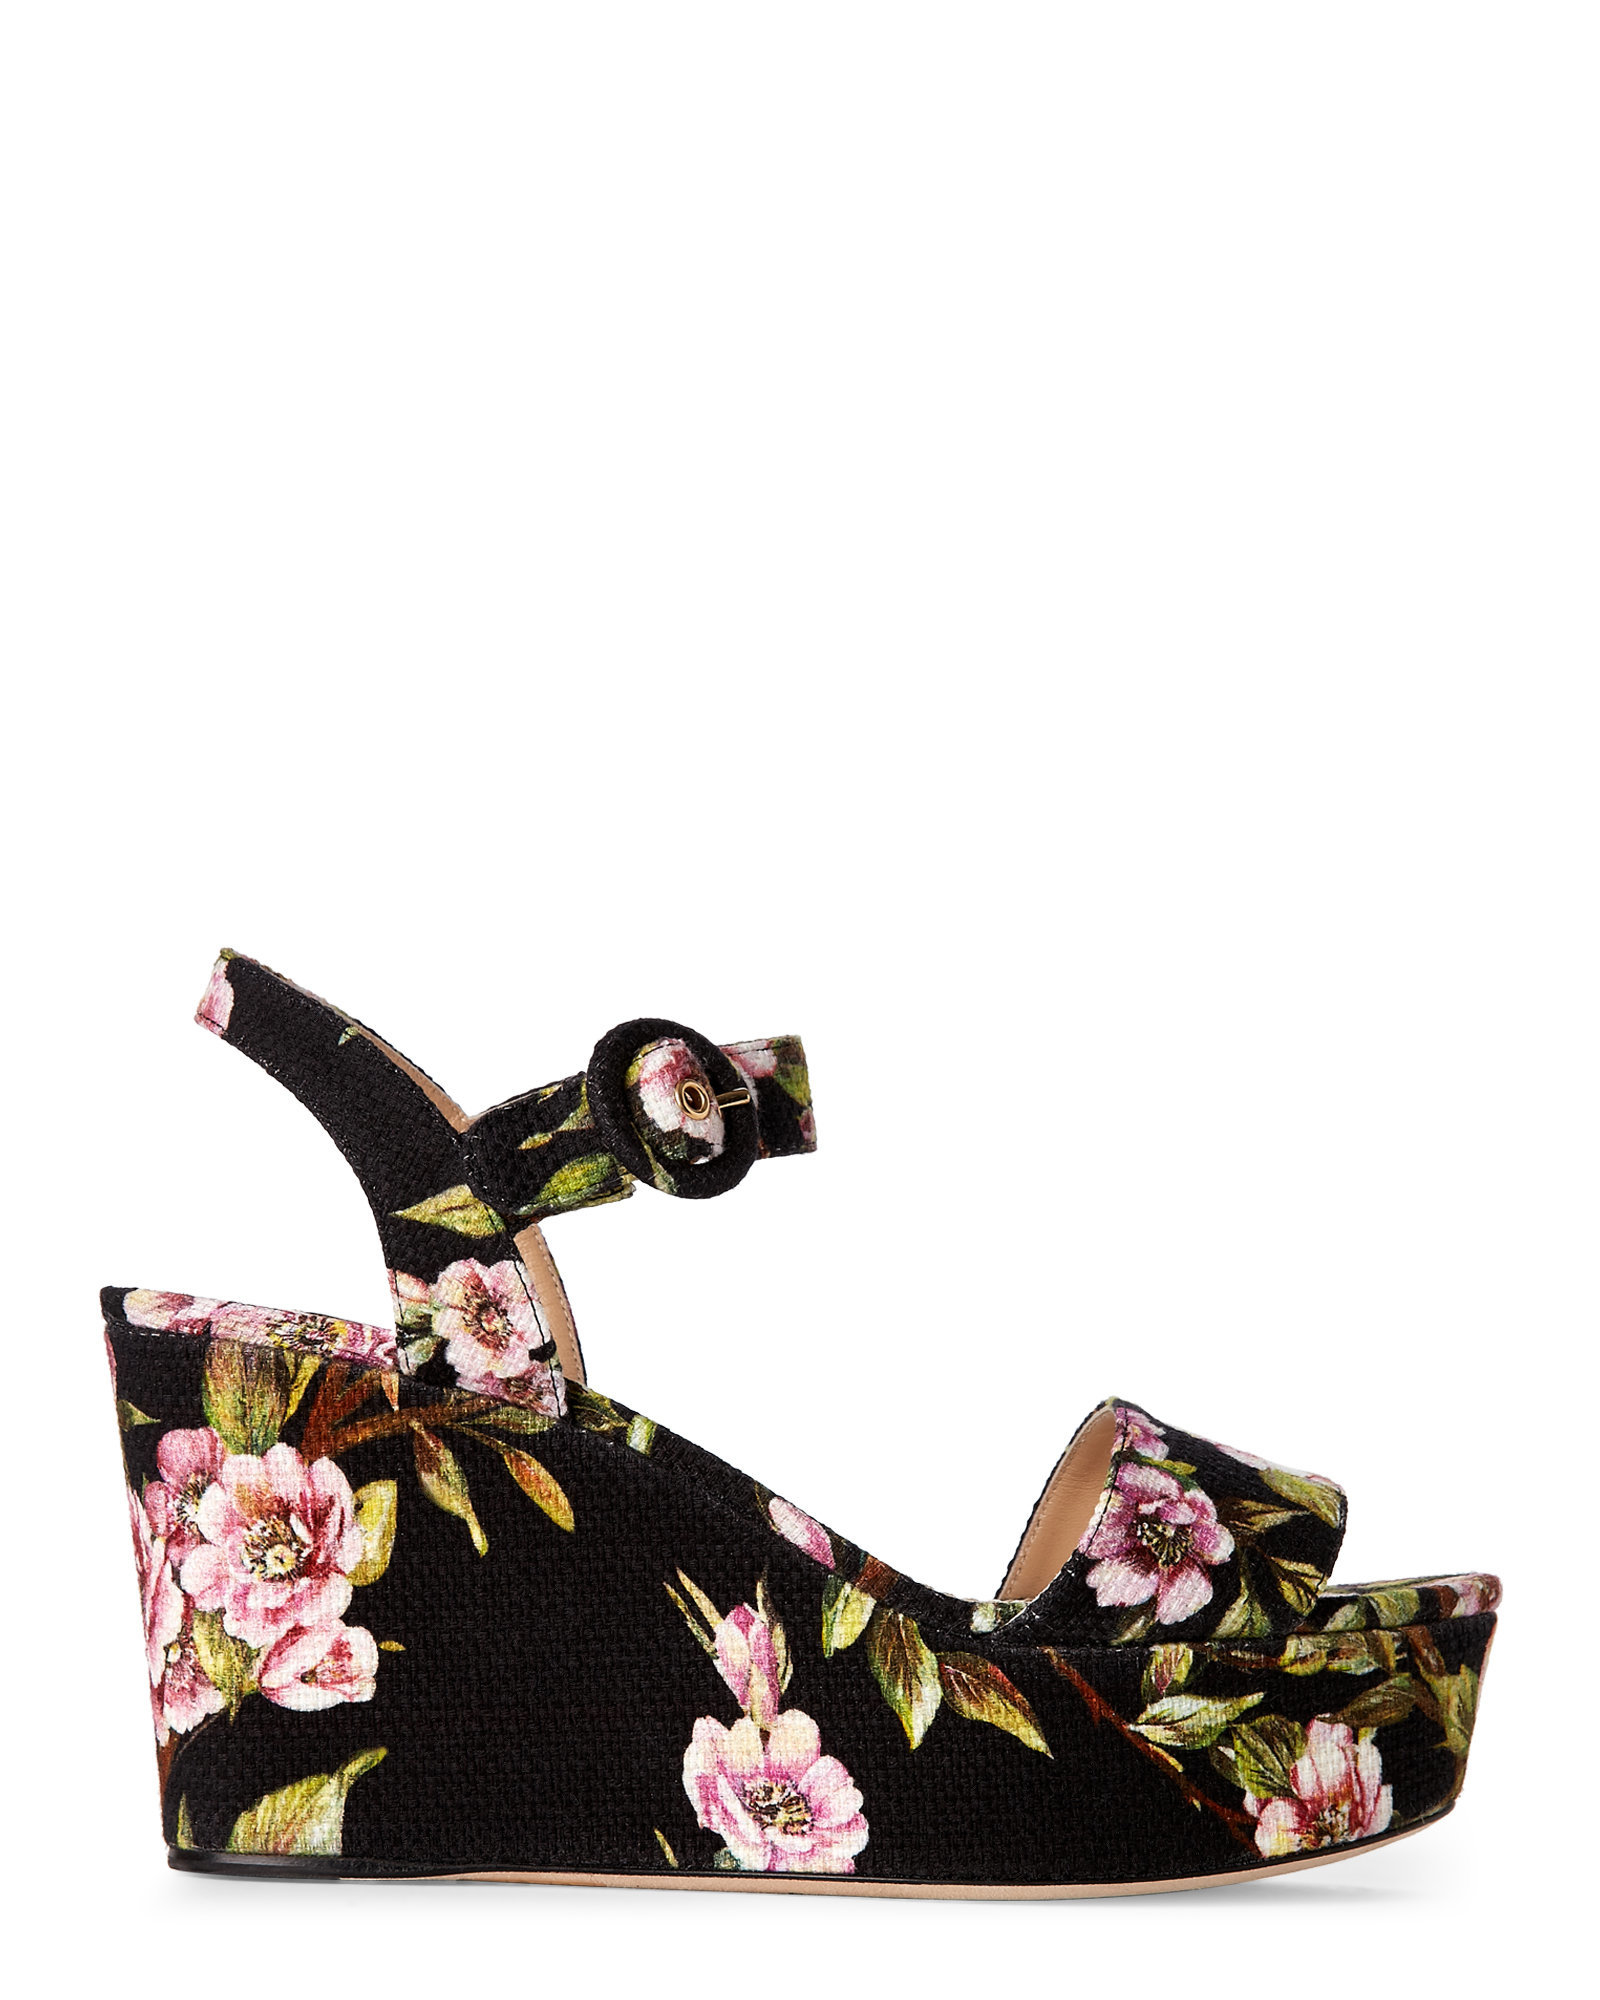 Dolce & Gabbana Floral Platform Sandals buy cheap perfect tWqeWwltnJ